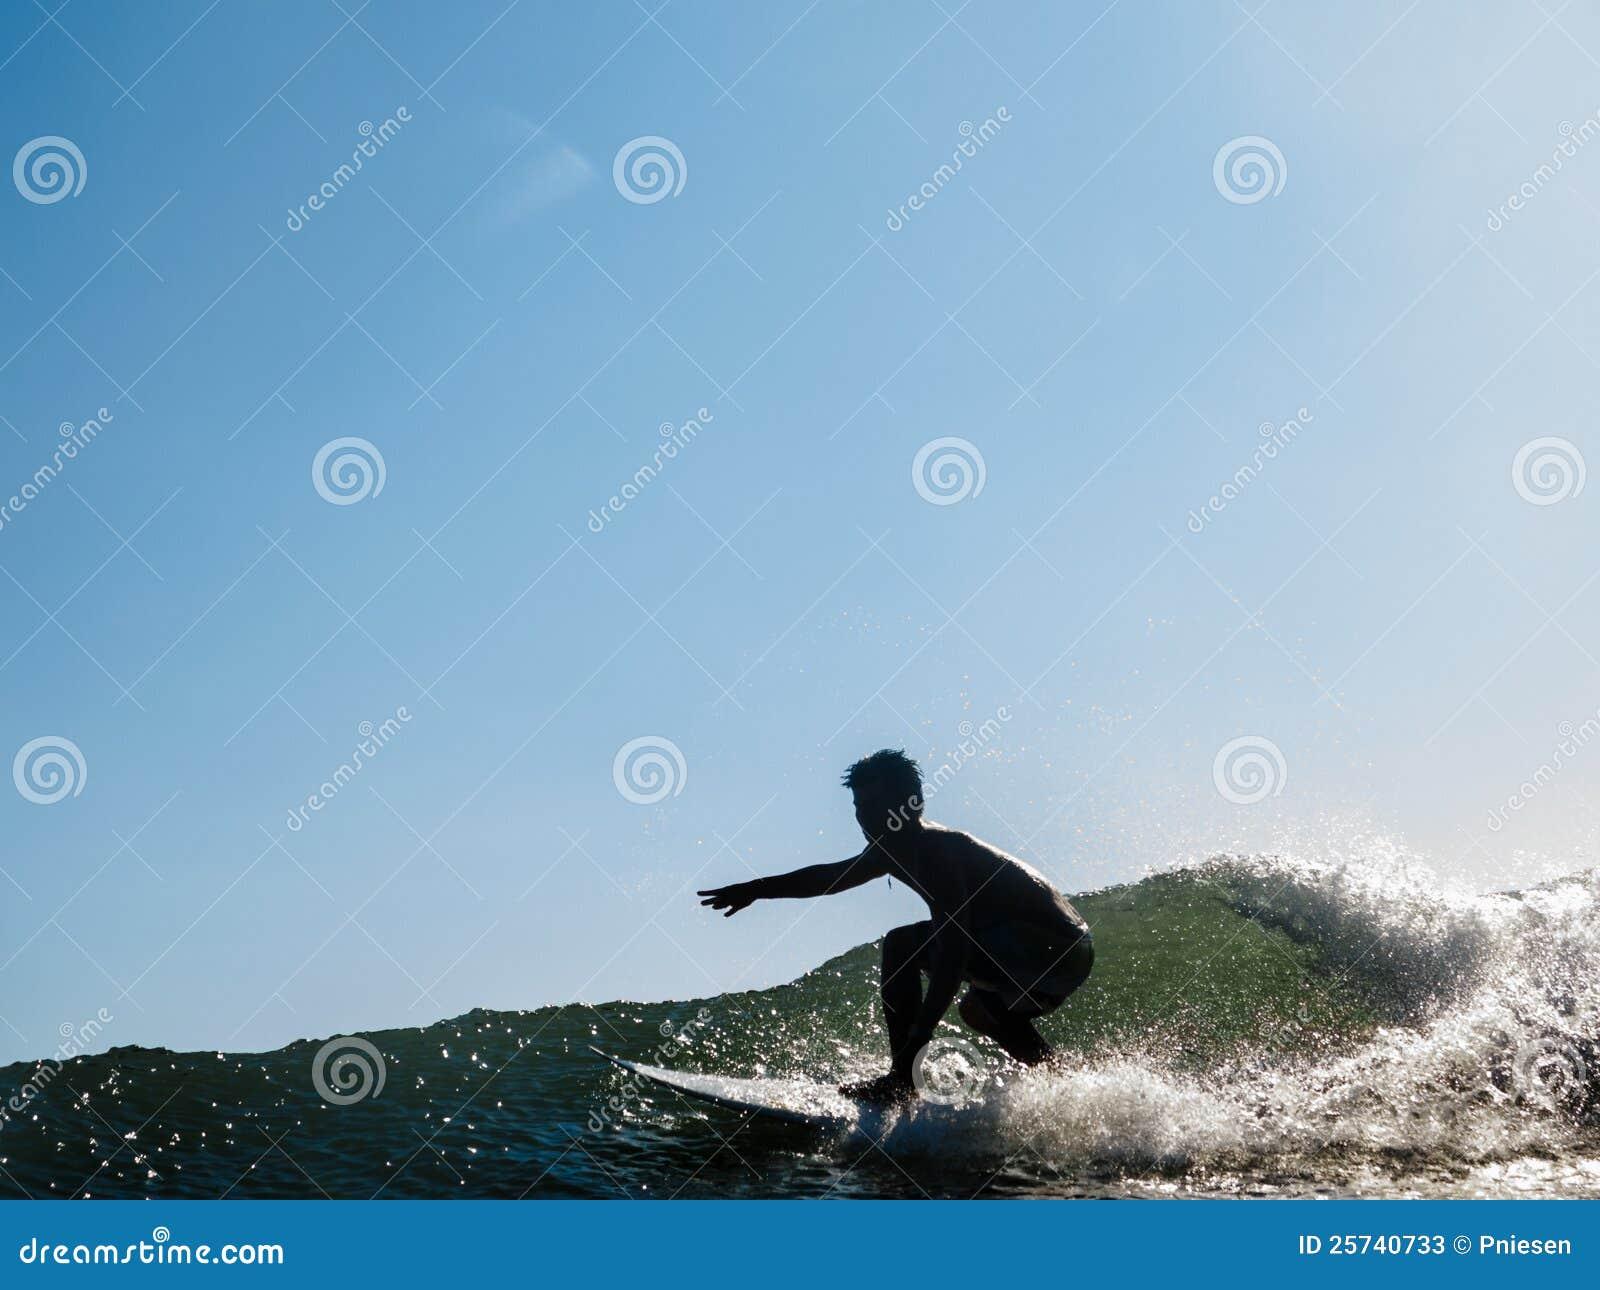 Surfer rides across wave